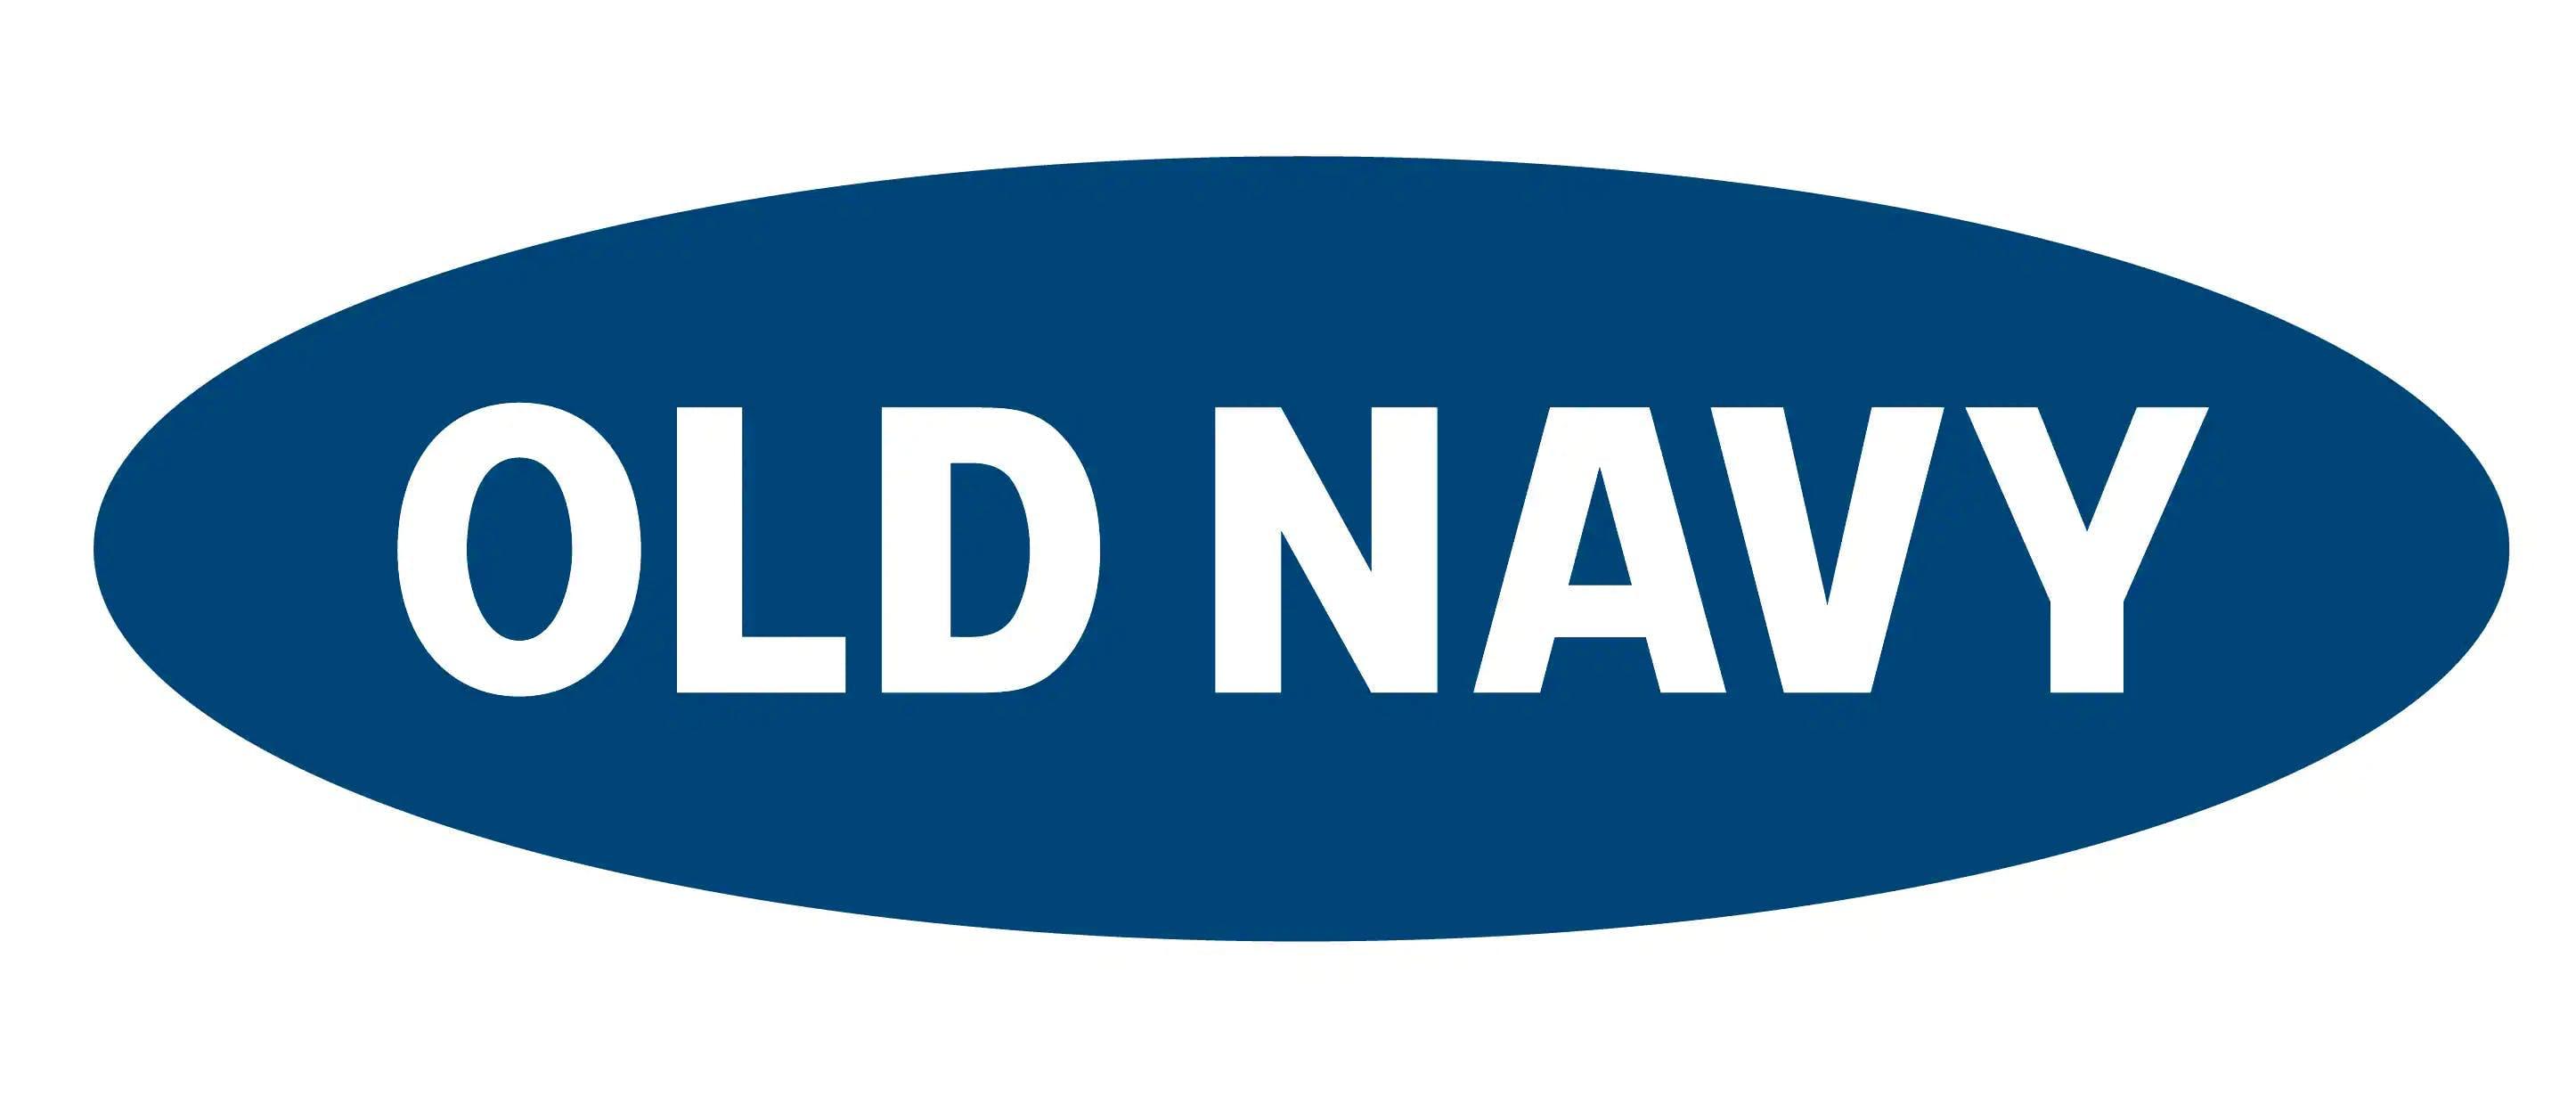 old navy logo3